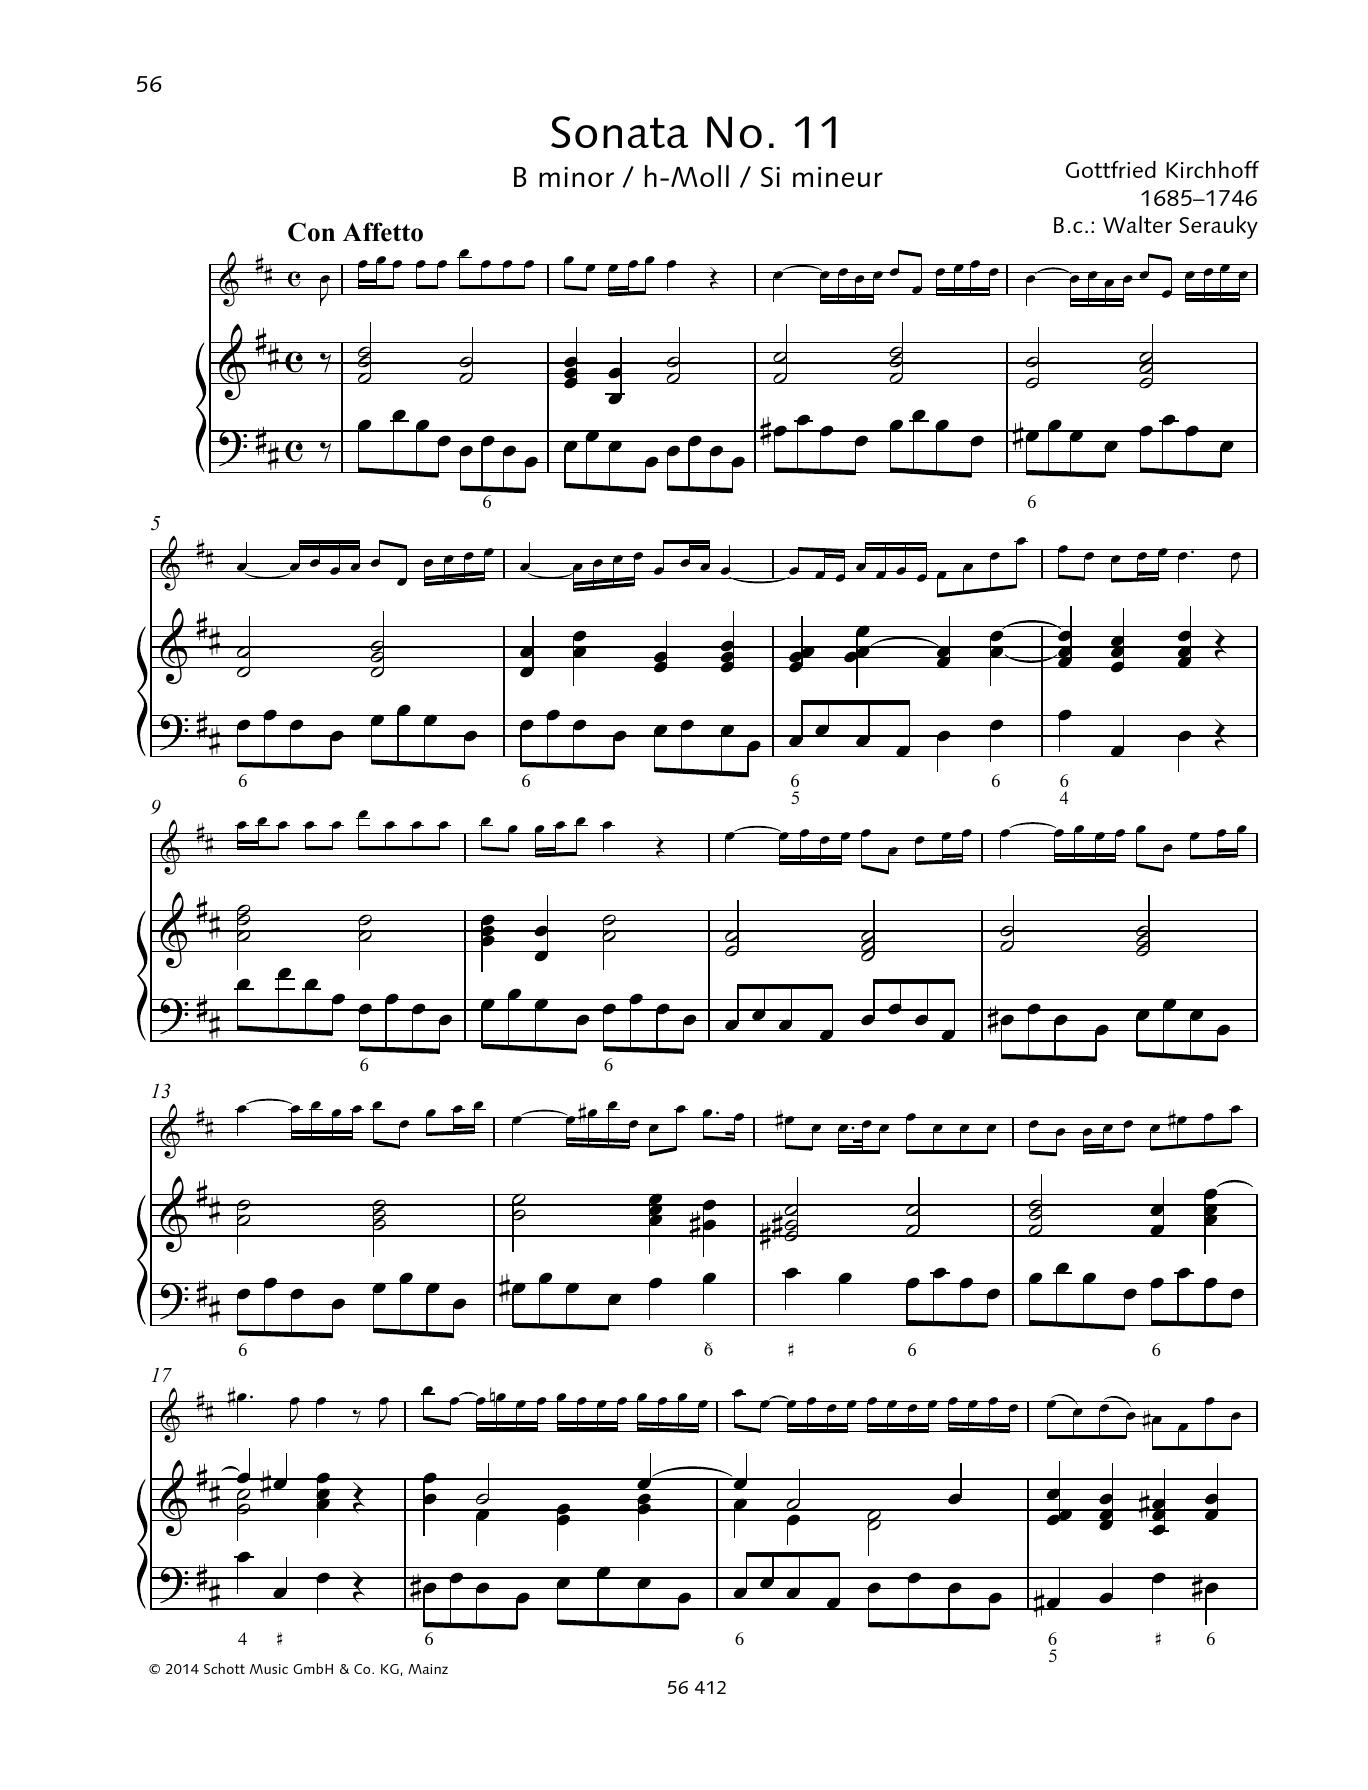 Sonata No. 11 B minor